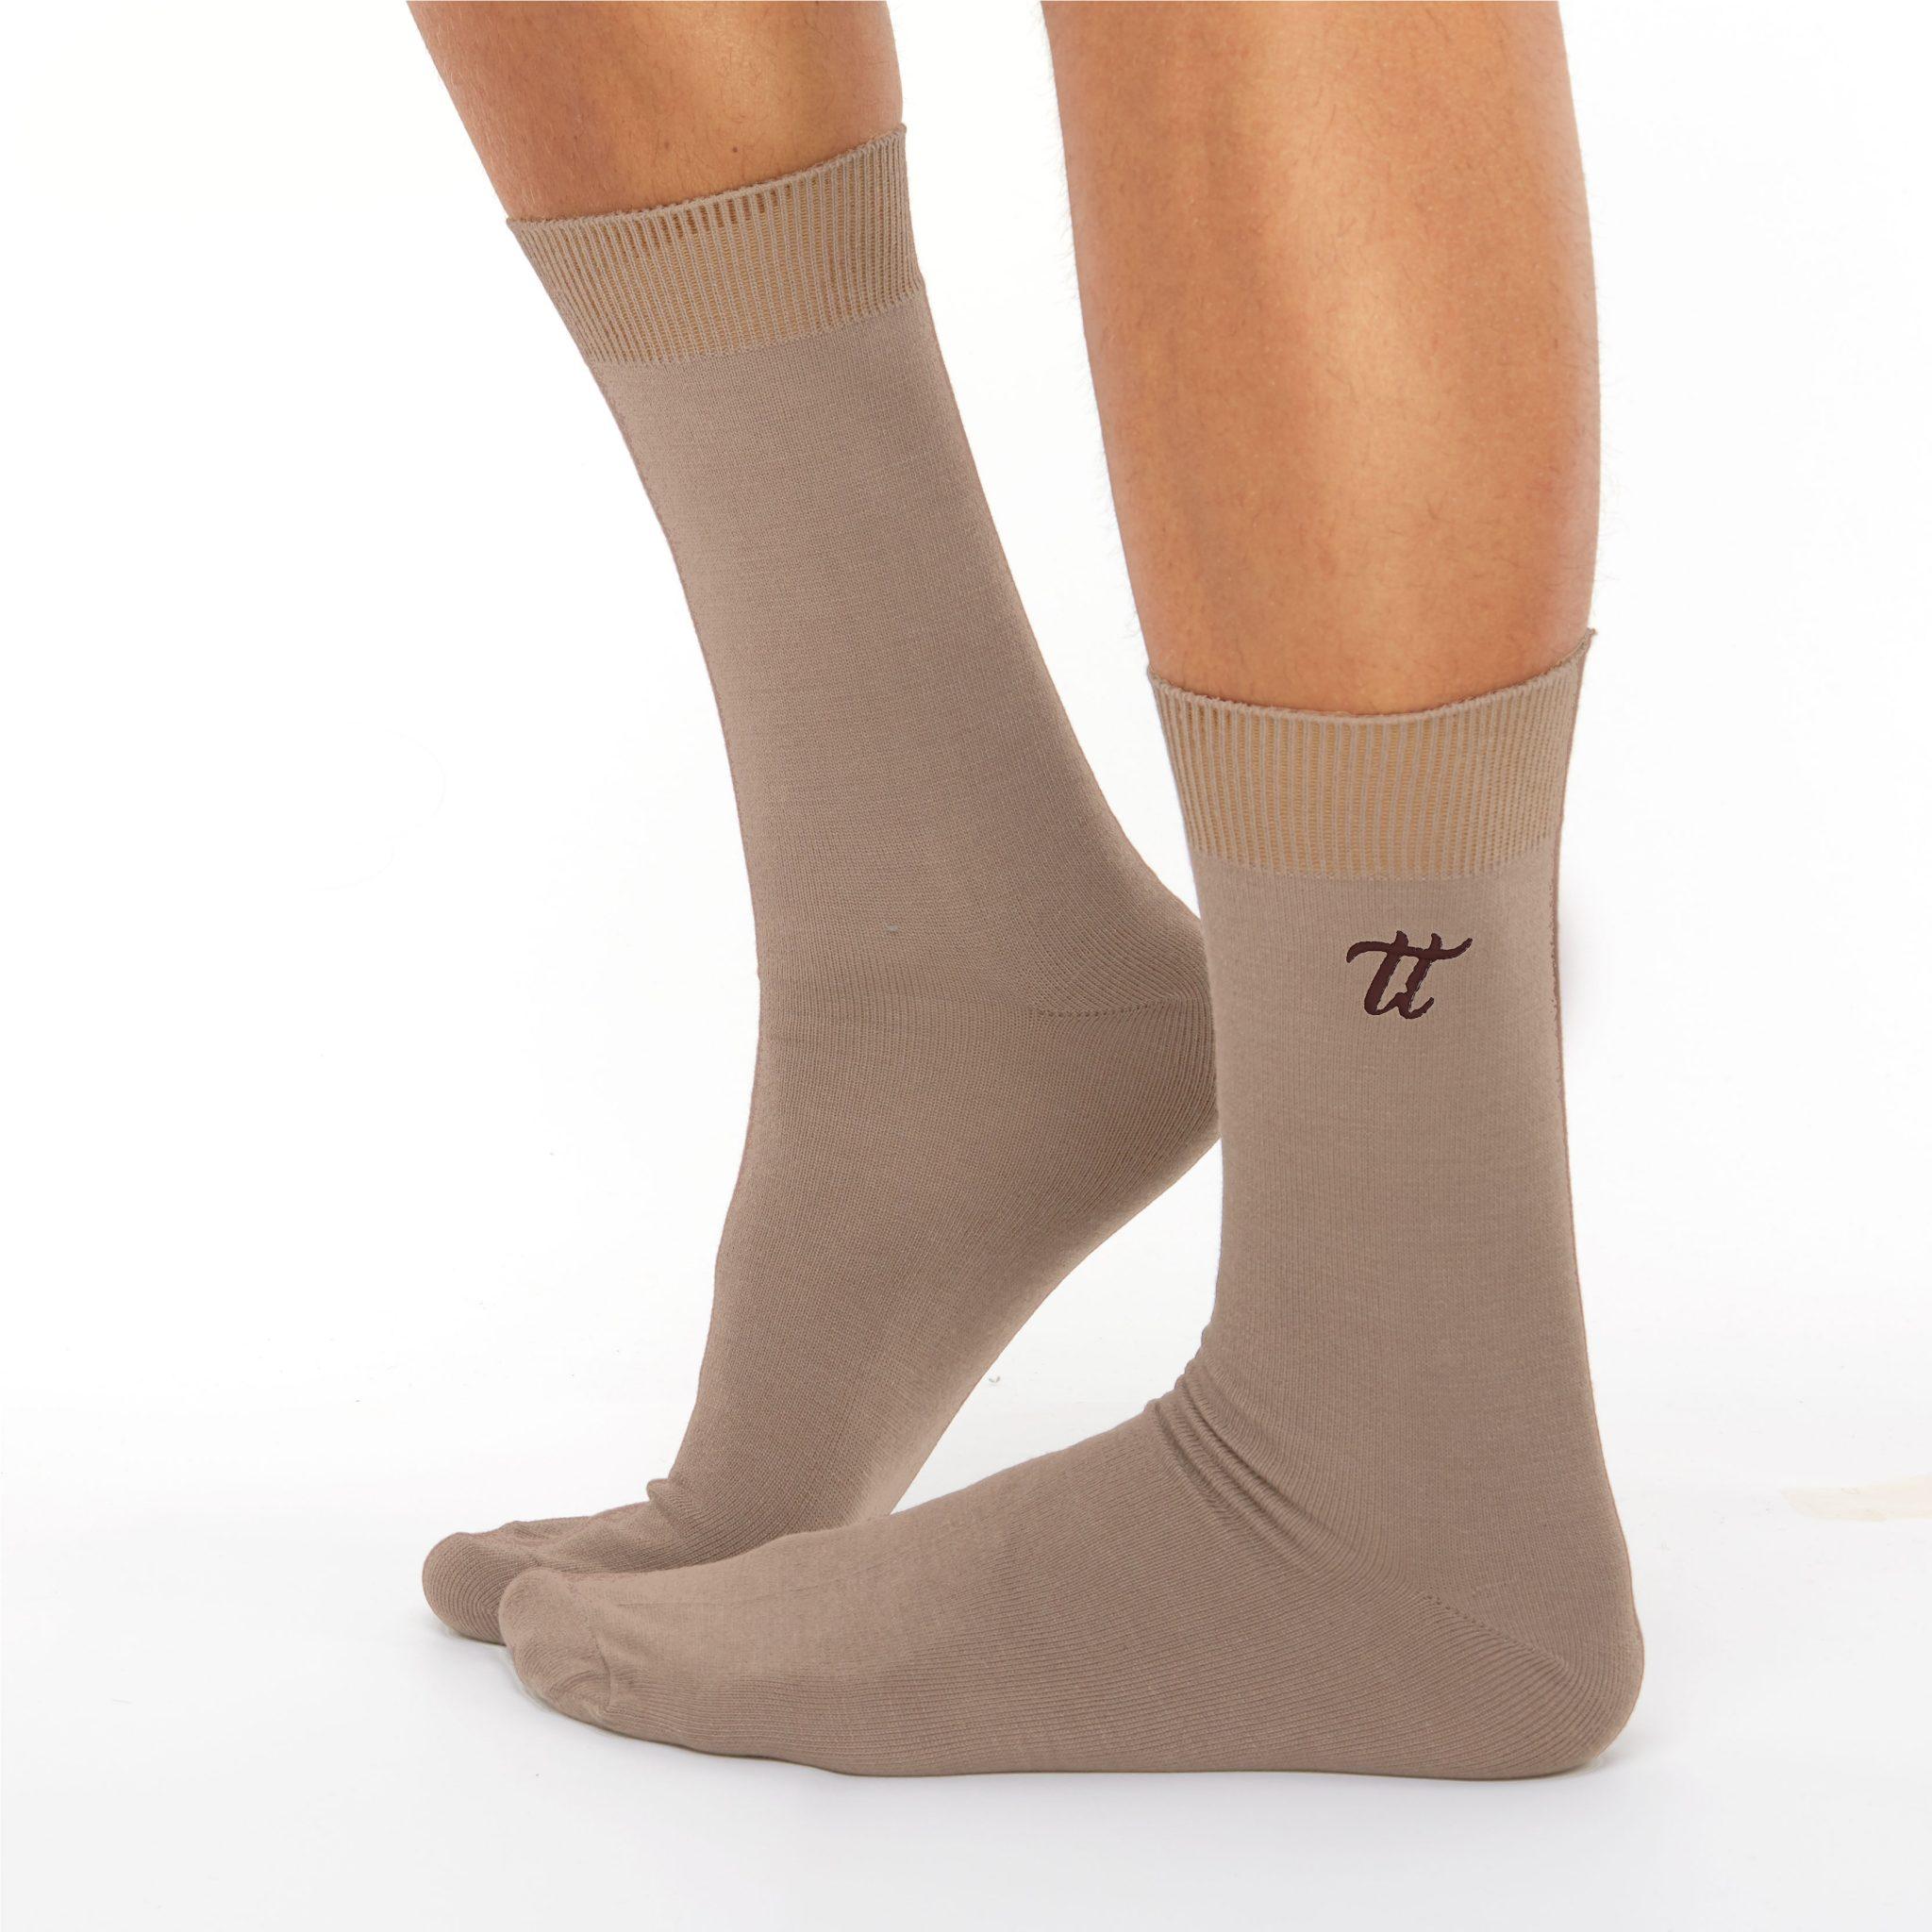 Men's warm cotton socks nude